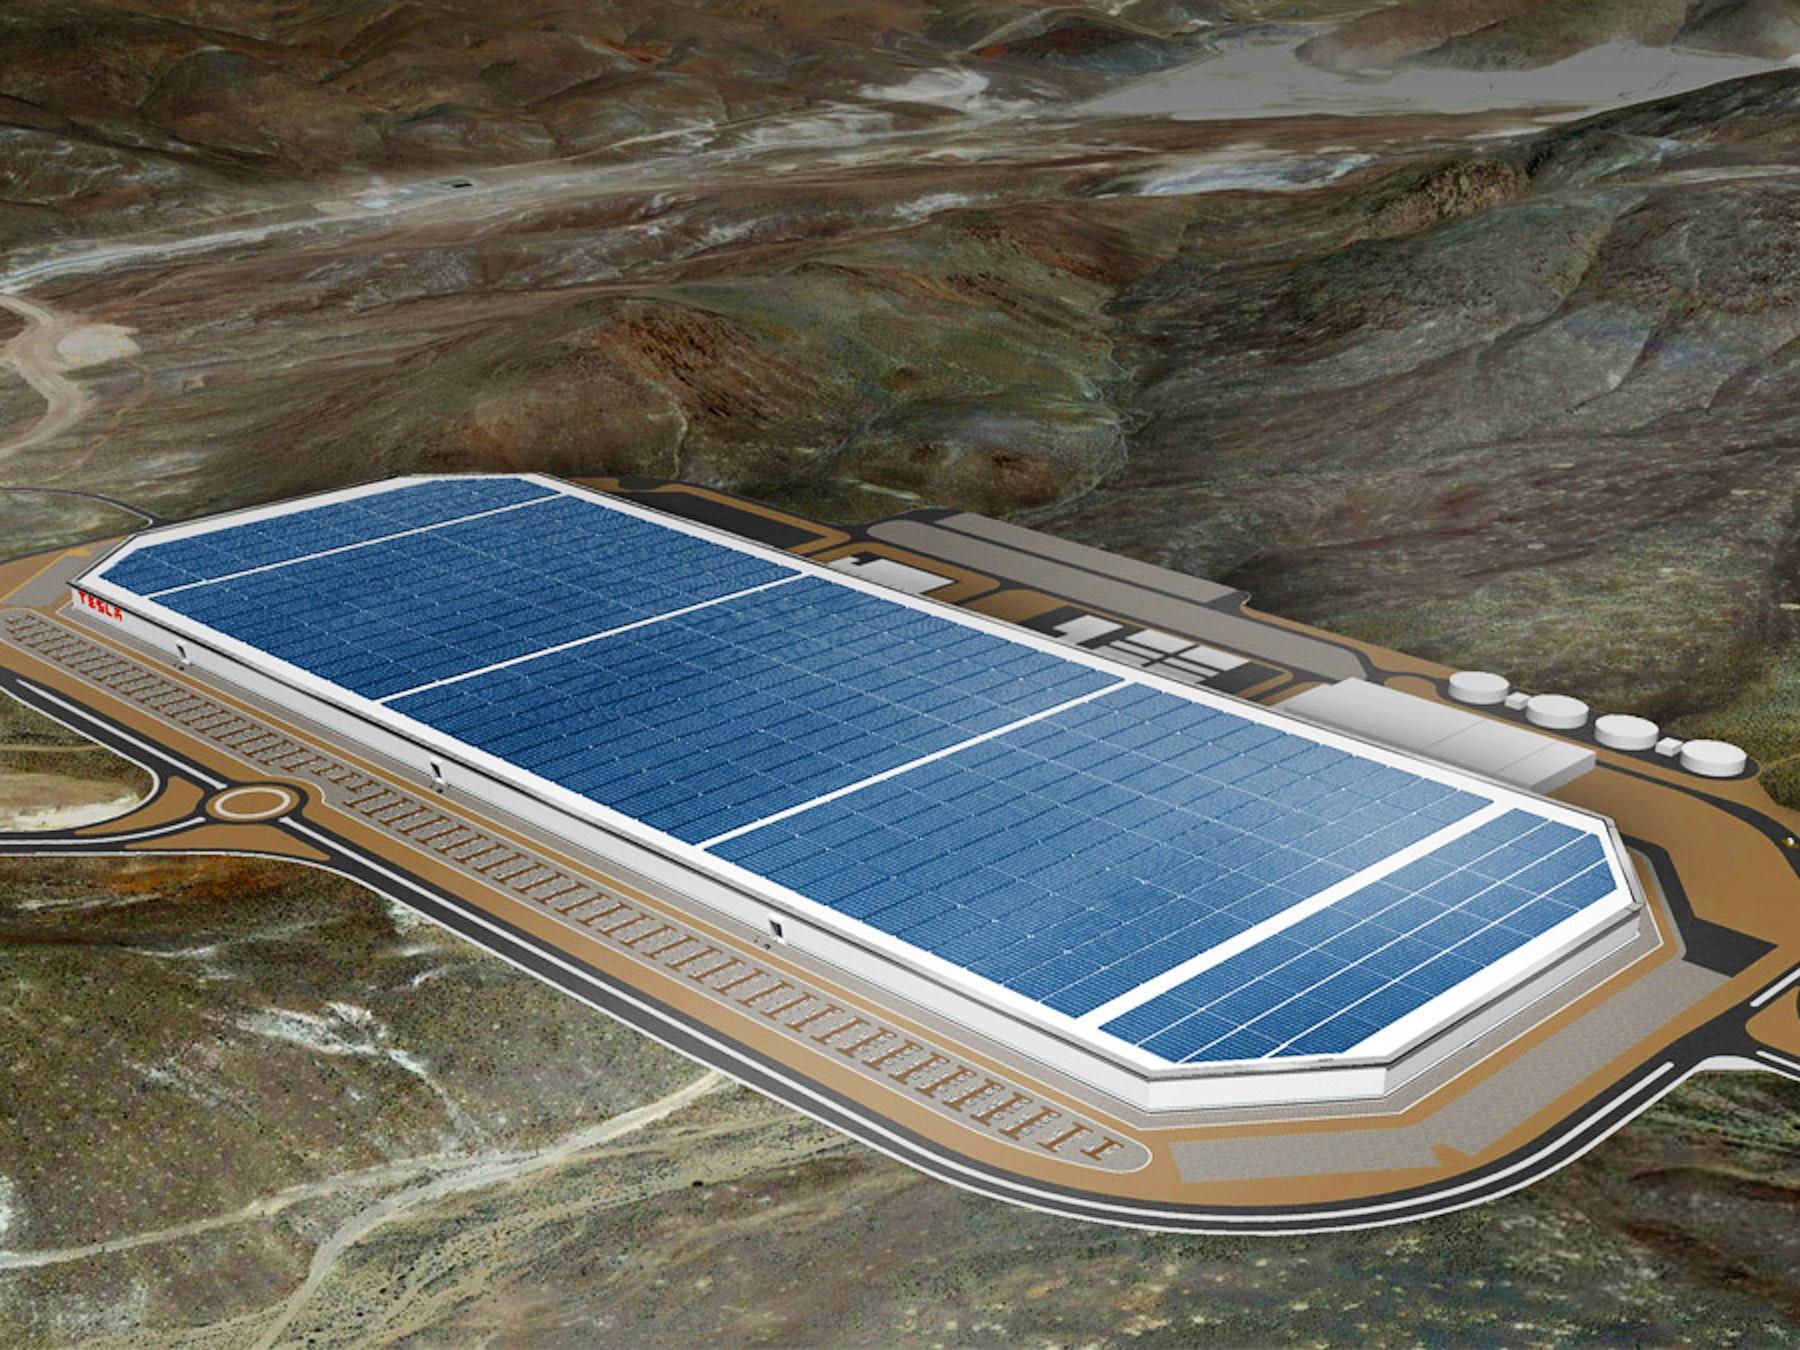 Tesla Doubles Gigafactory Work Ahead of July 29 Grand Opening